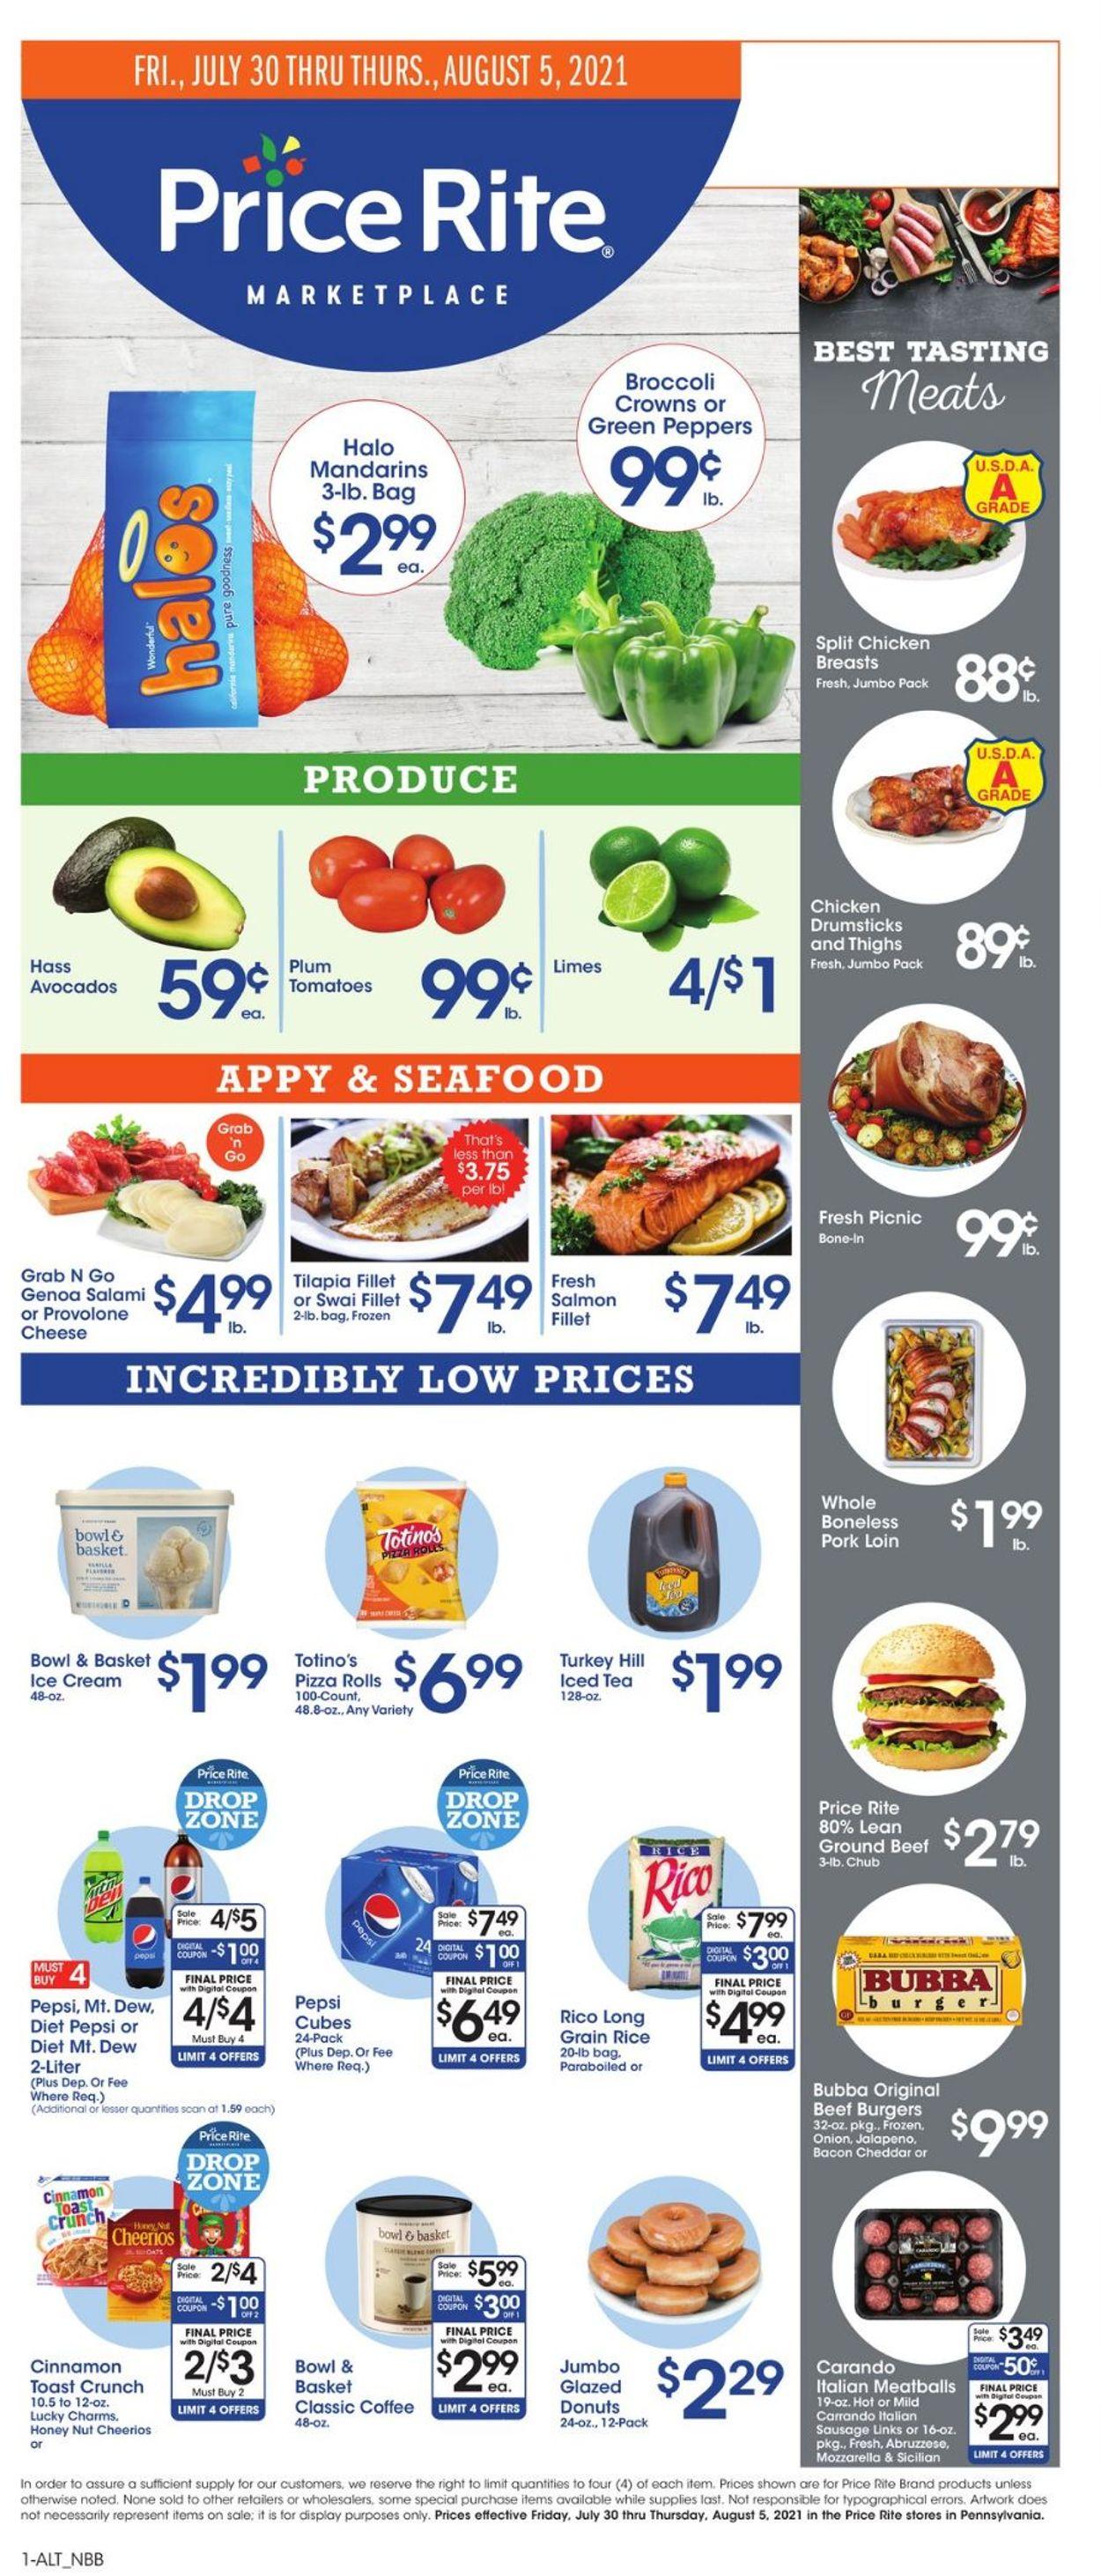 Price Rite Weekly Ad Circular - valid 07/30-08/05/2021